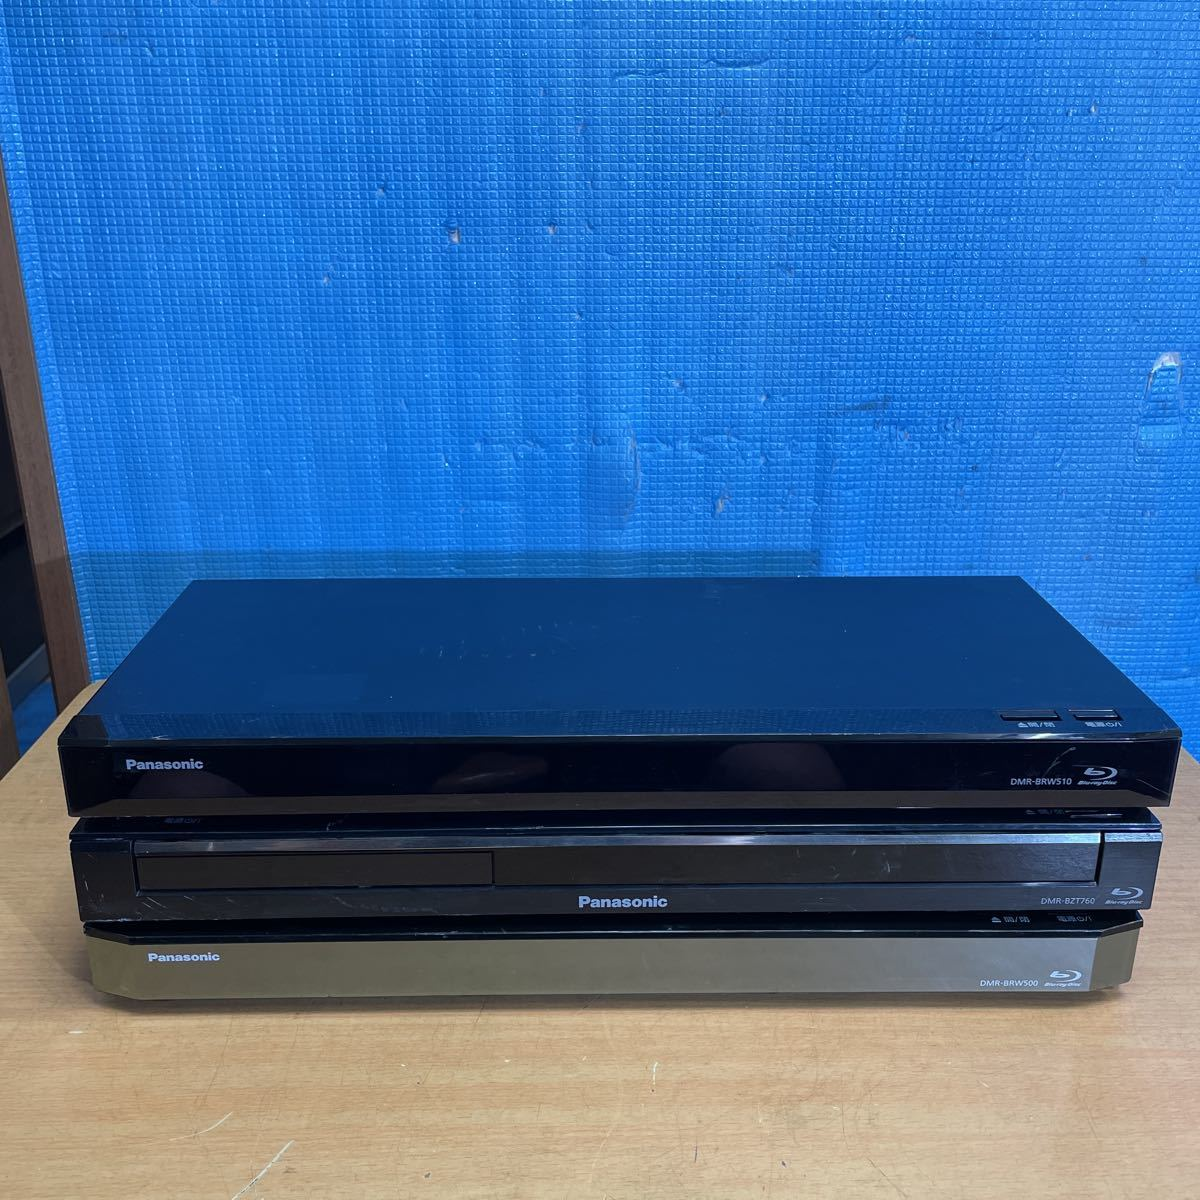 Panasonic DIGA ブルーレイディスクレコーダー DMR-BRW510・DMR-BZT760・DMR-BRW500 ★ジャンク品★ (3)